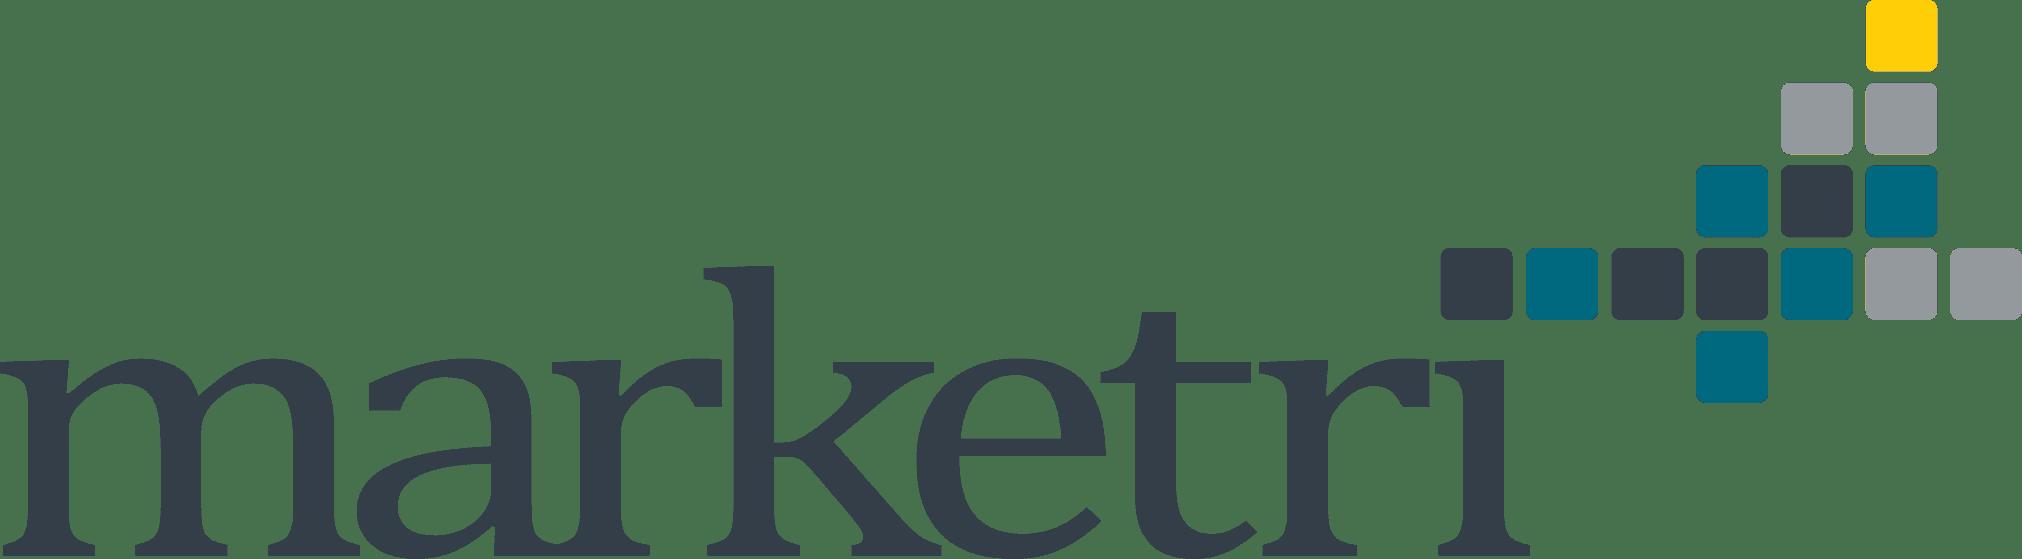 Marketri-Logo_2017_FINAL